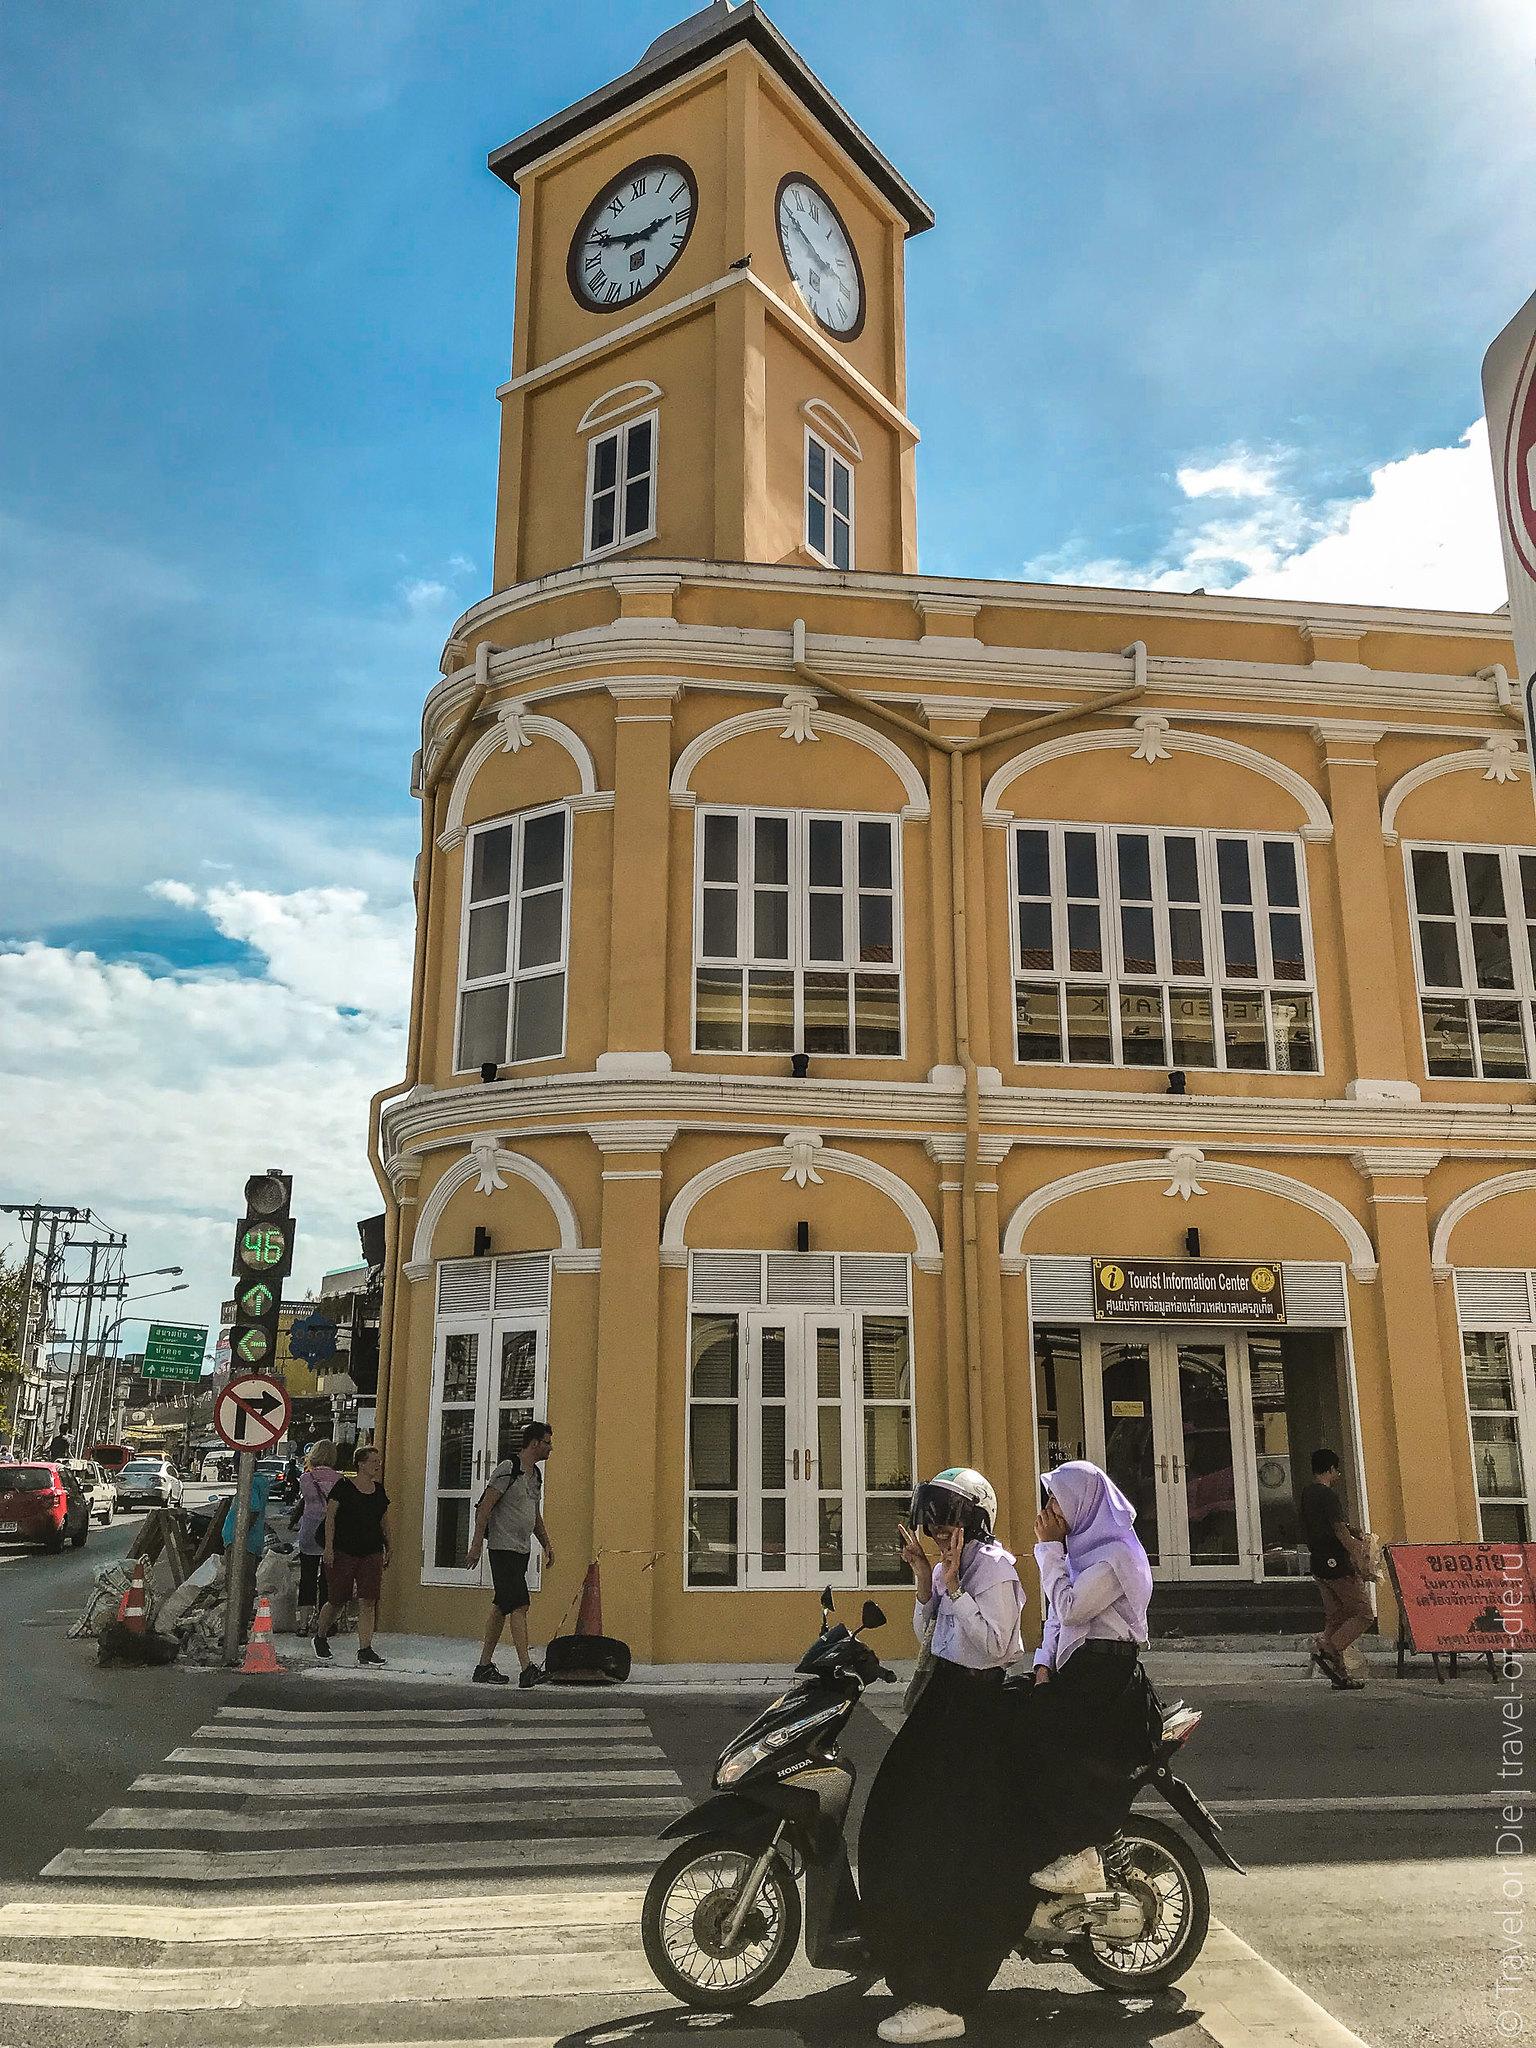 Phuket-Town-Old-Town-Thailand-3939